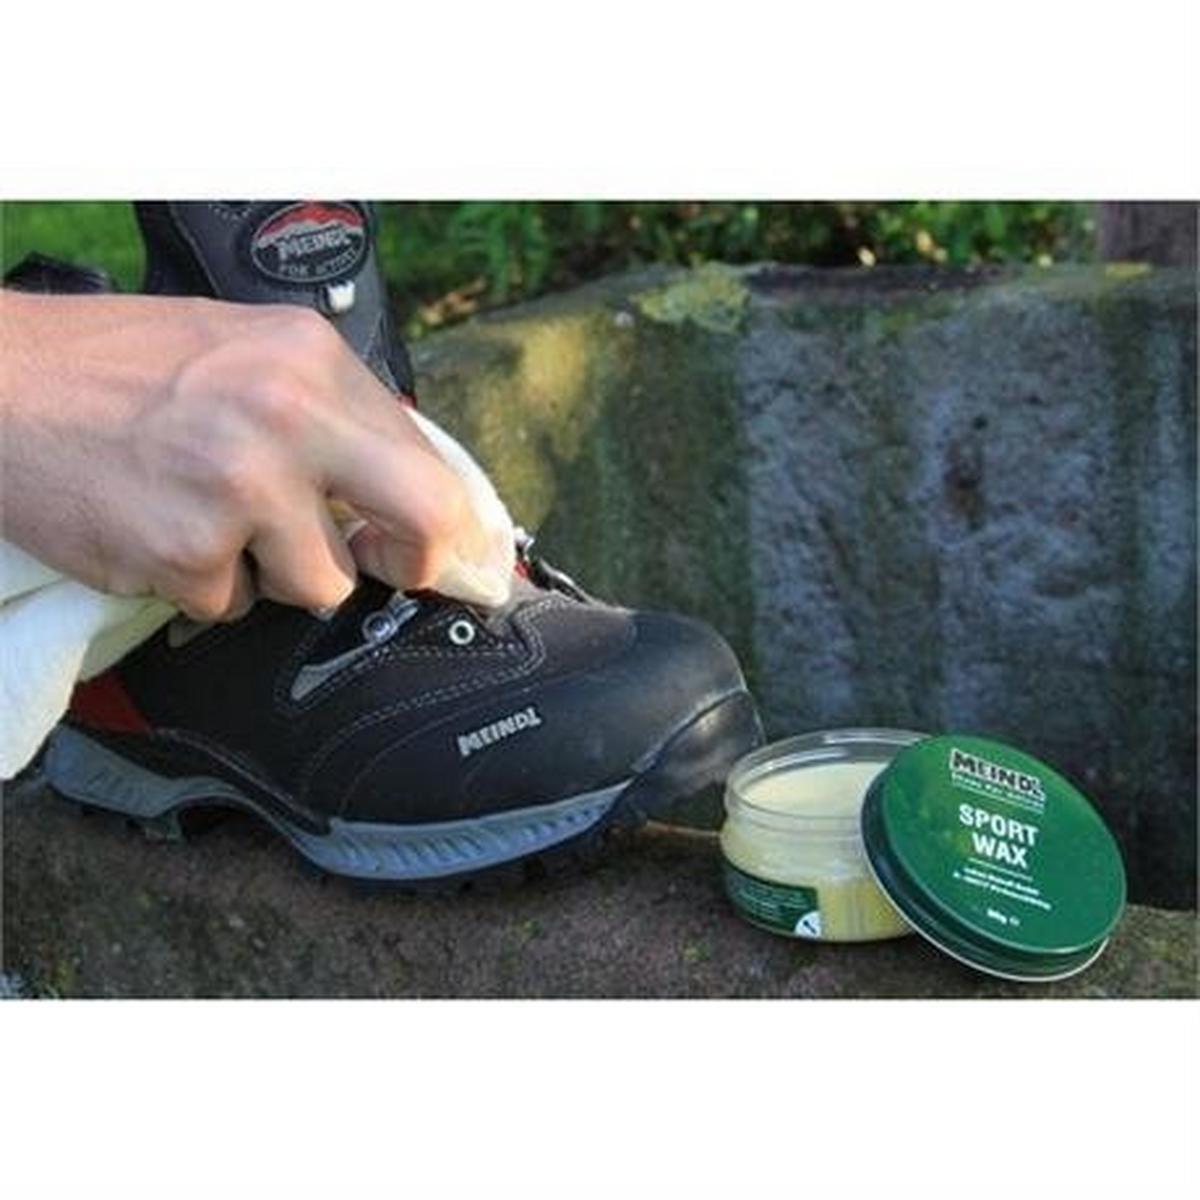 Meindl Shoe & Boot Care Sportwax